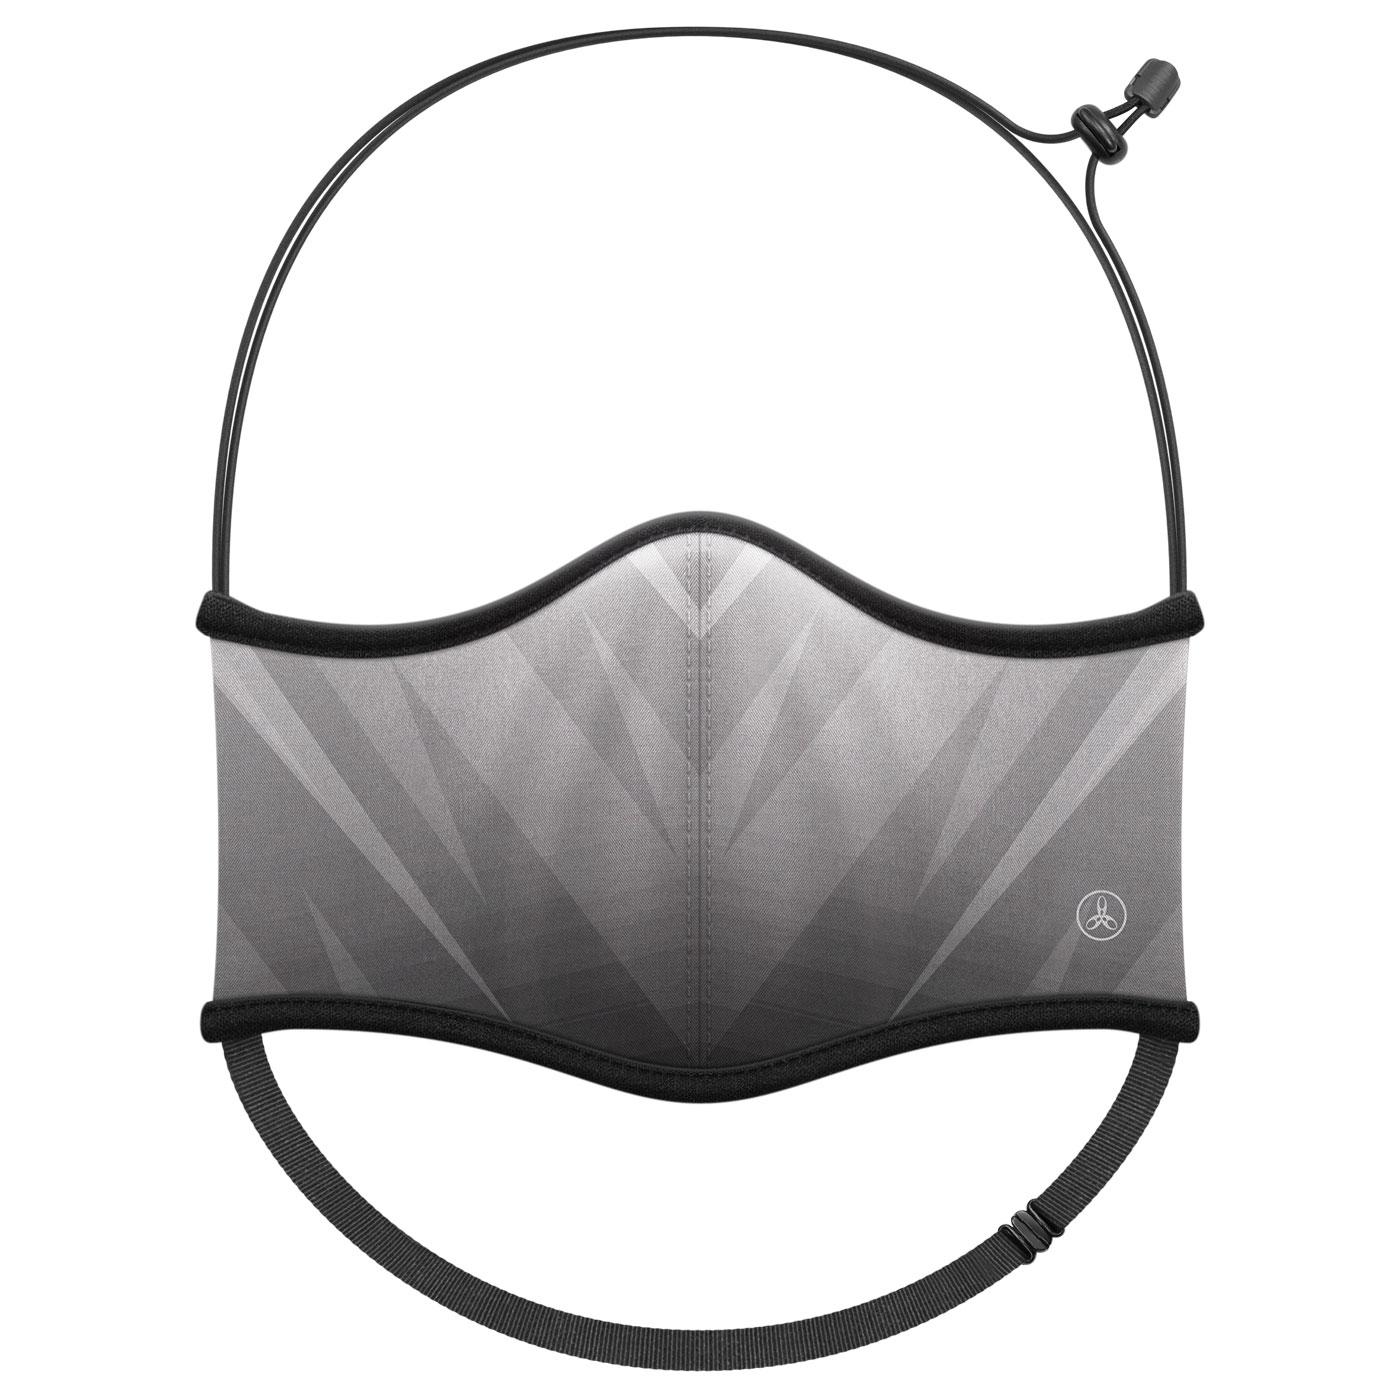 HODARLA 運動舒適口罩6032201 - 深灰白